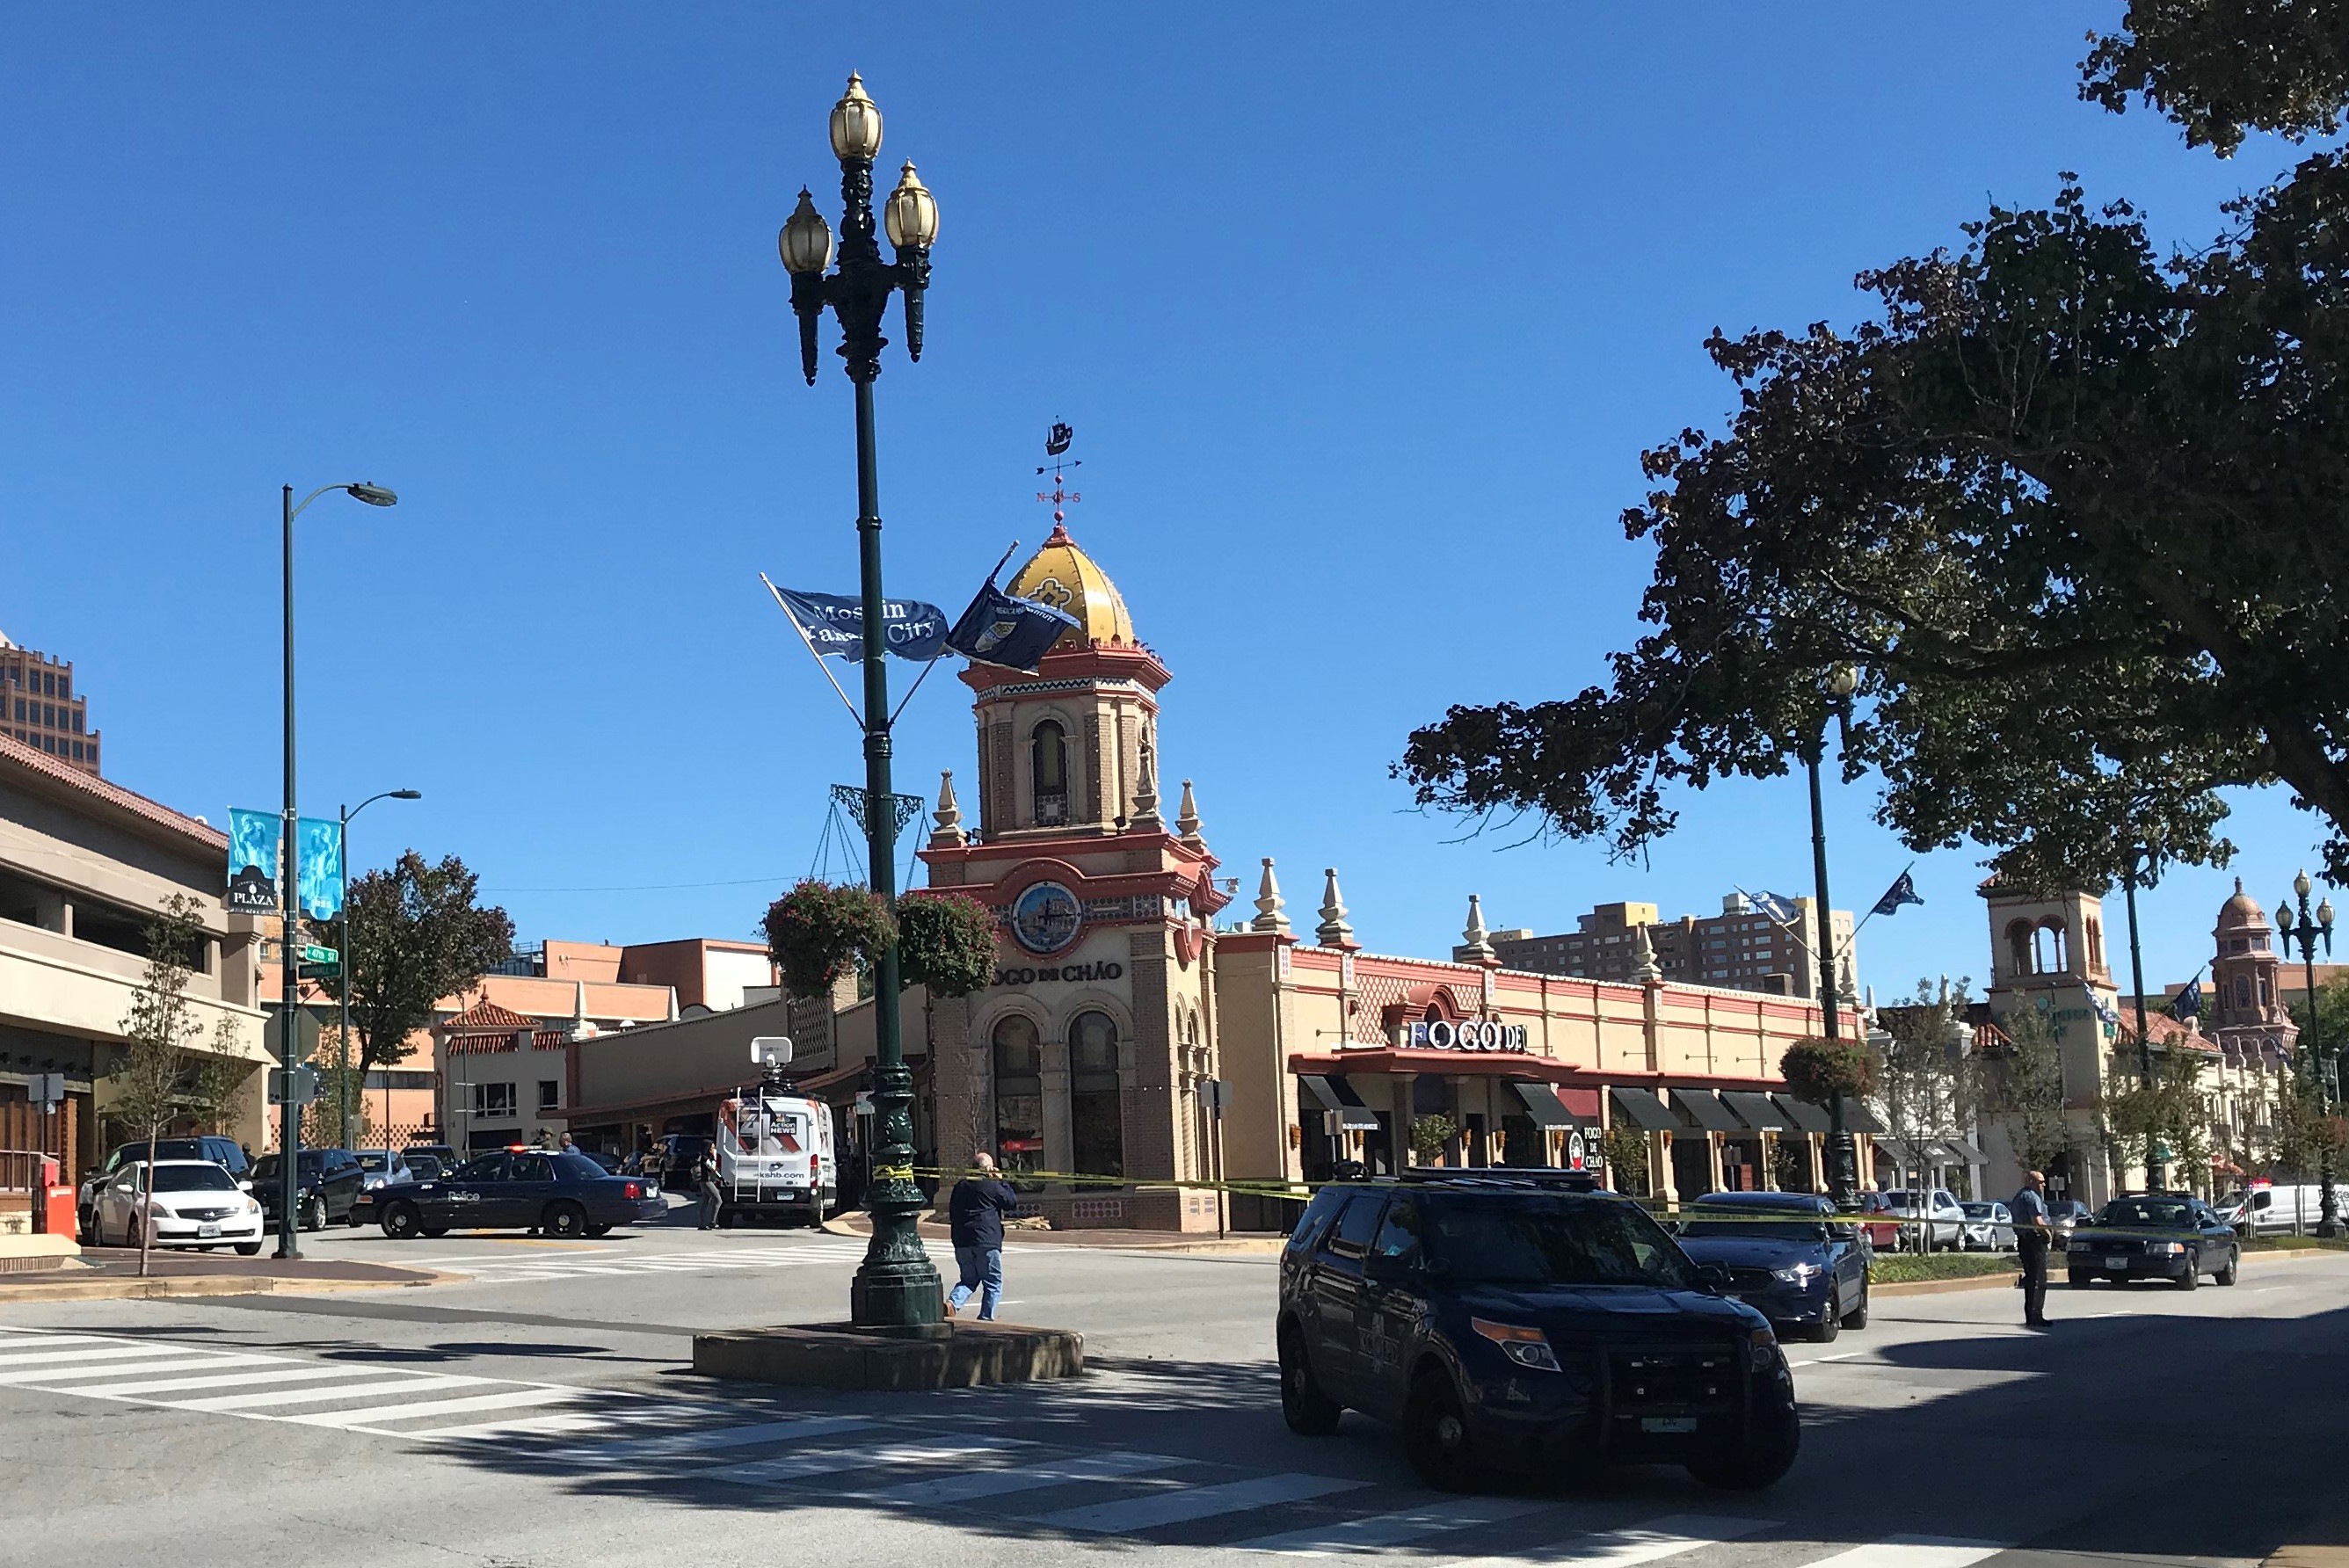 Обои missouri, kansas city, country club plaza, Jc nichols memorial fountain, канзас-сити. Города foto 16